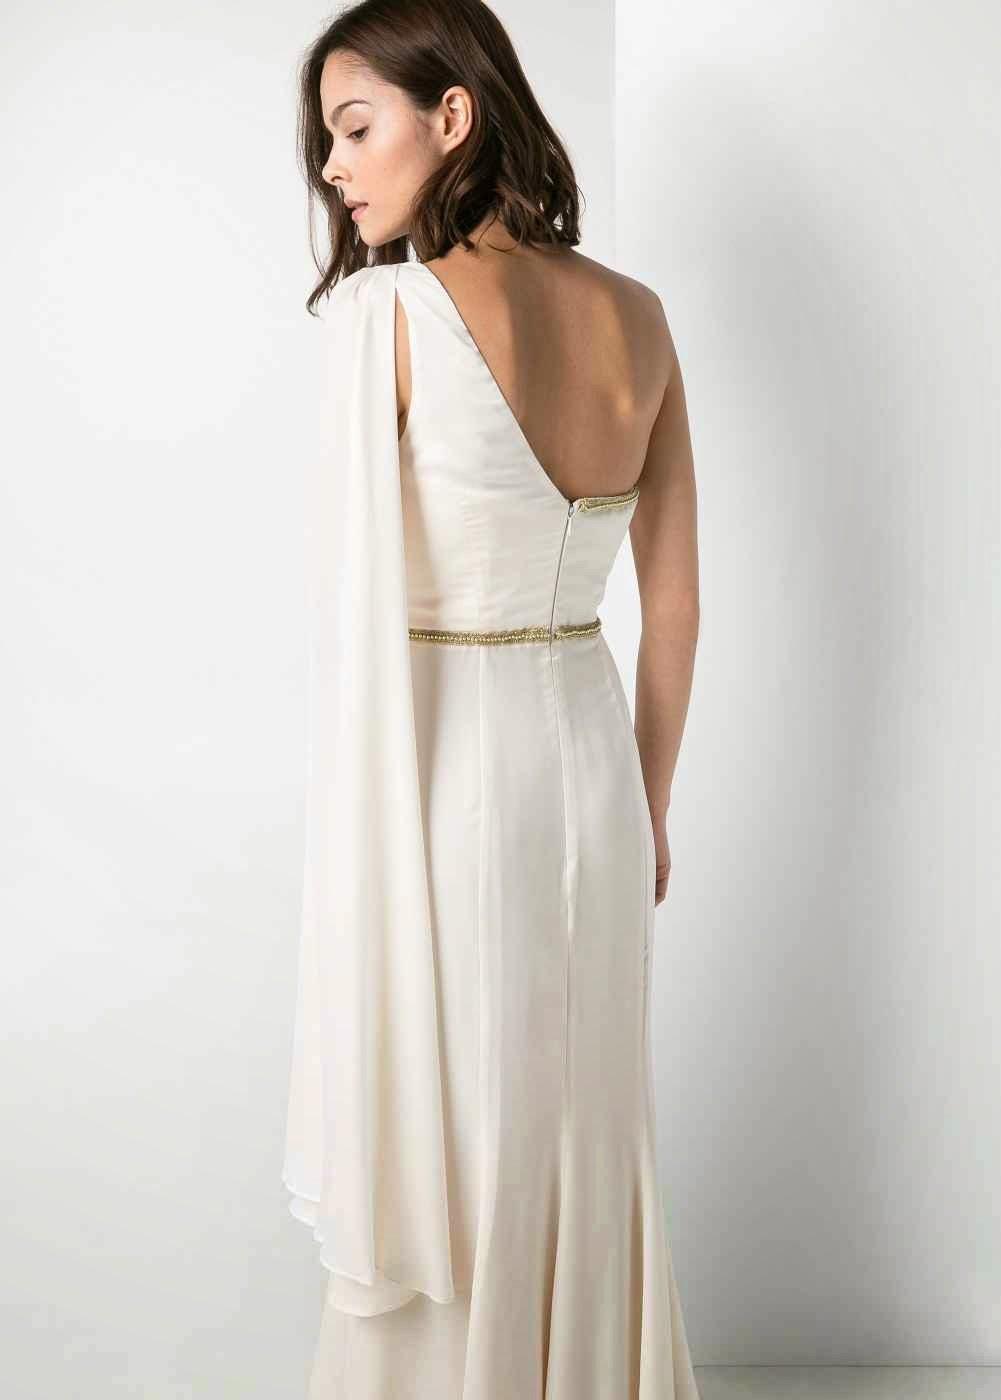 Vestido Helénico de Novia de Mango.